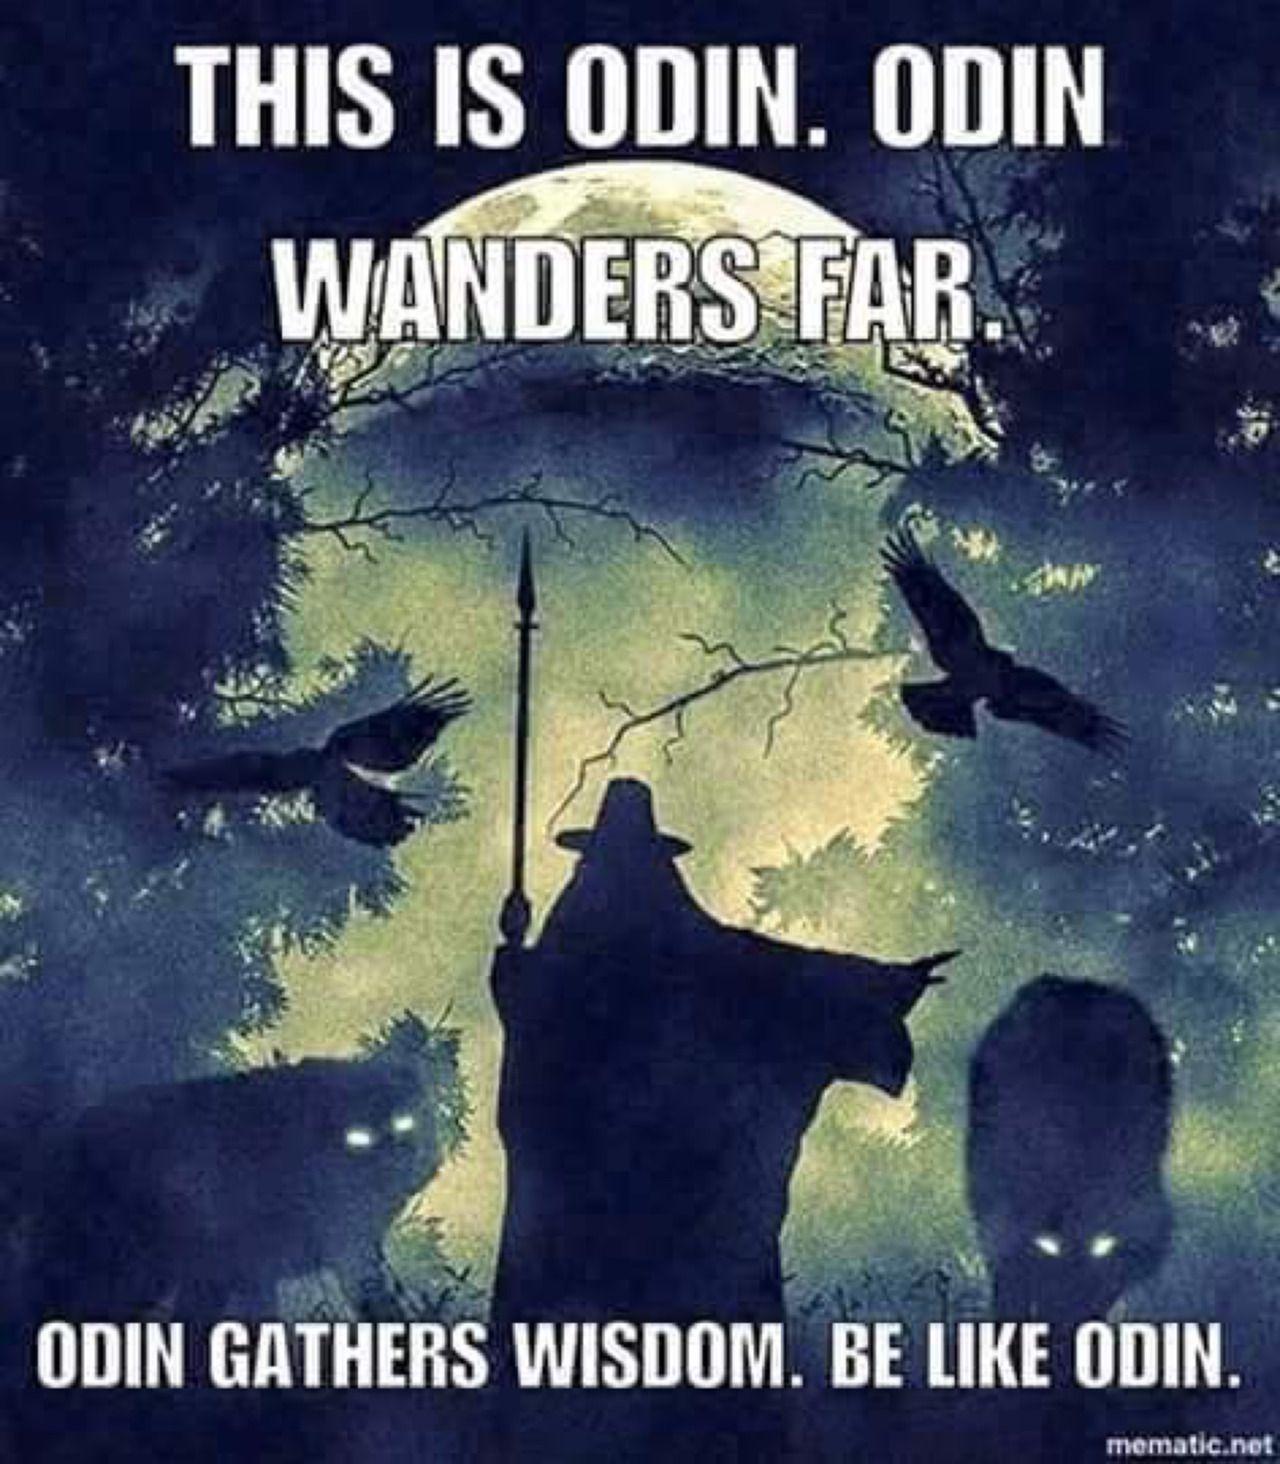 This is Odin. Odin wanders far. Odin gathers wisdom. Be like Odin.